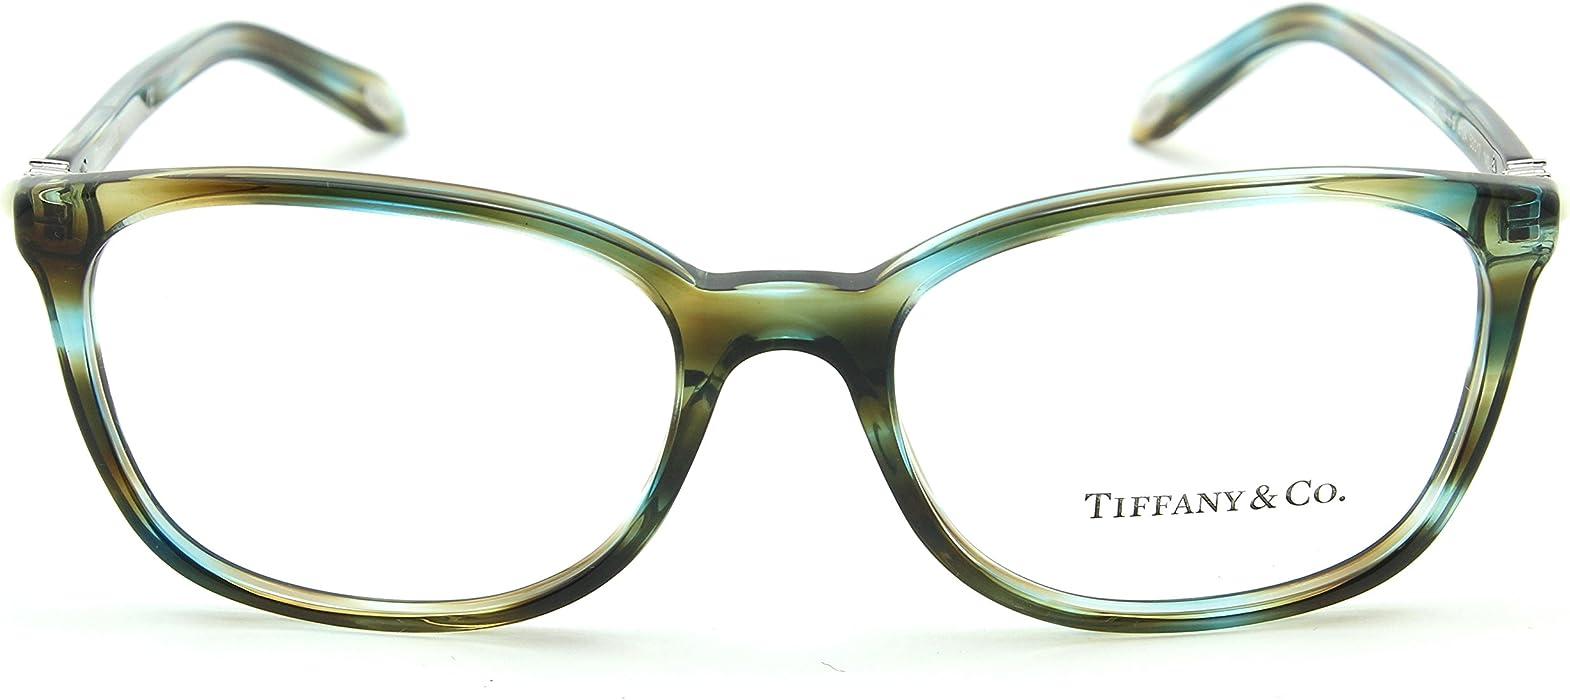 e6ffecd8ef9 TF 2109-HB Women Eyeglasses RX - able Frame (8124) 51mm. Tiffany   Co.